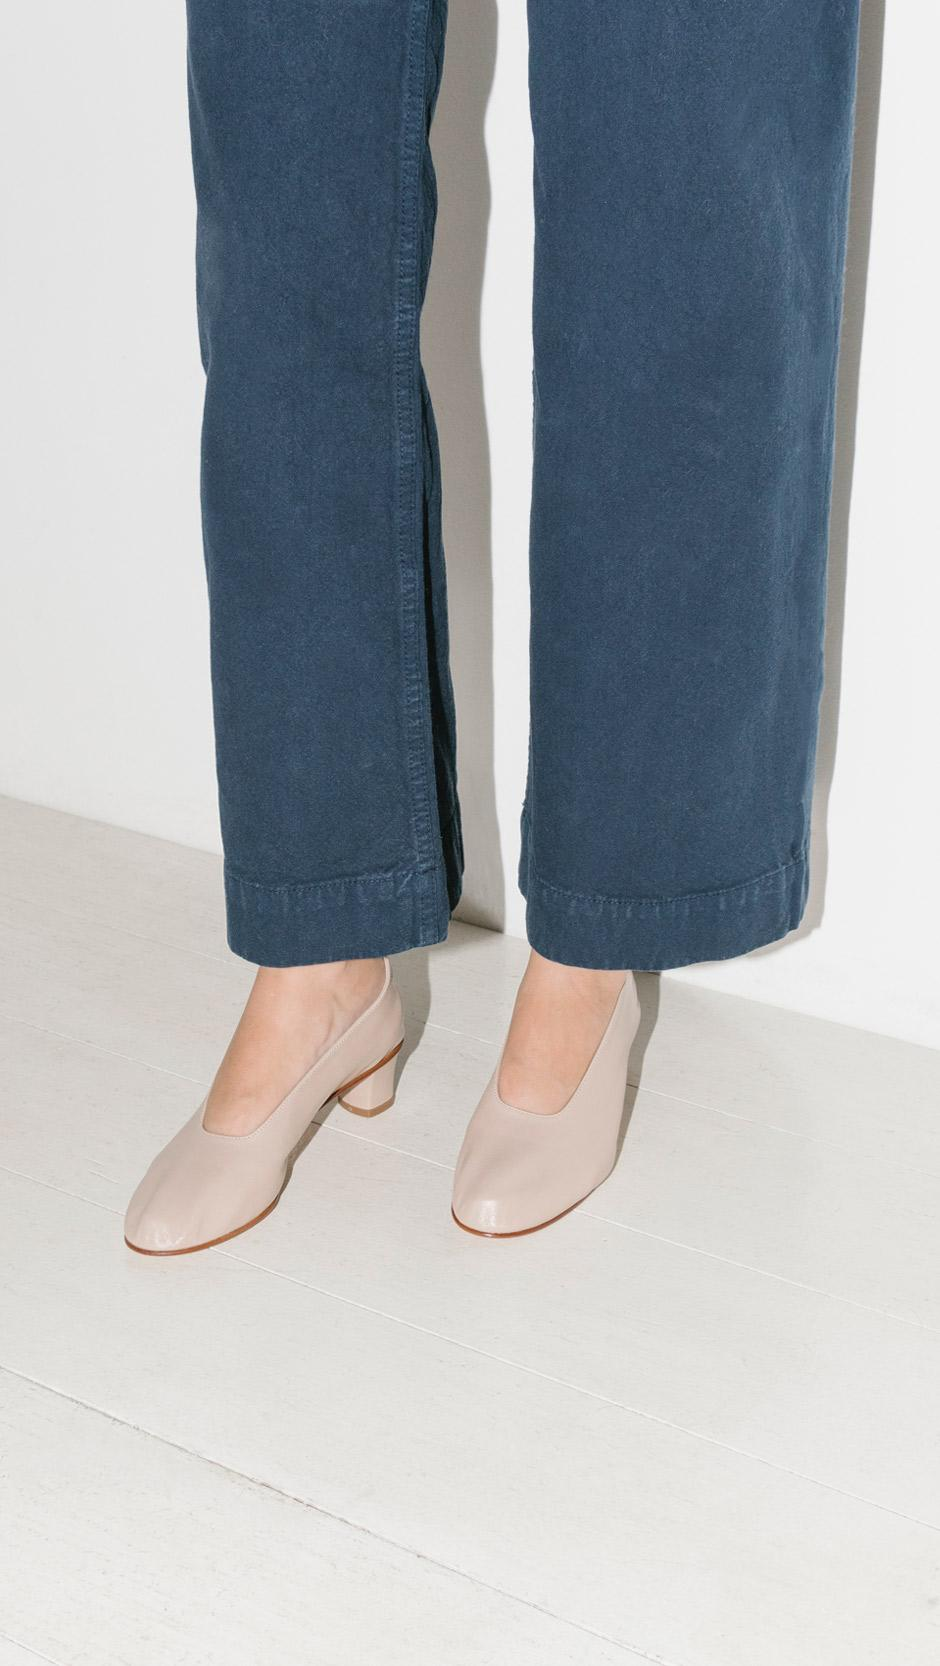 Martiniano Glove Shoe Sizing